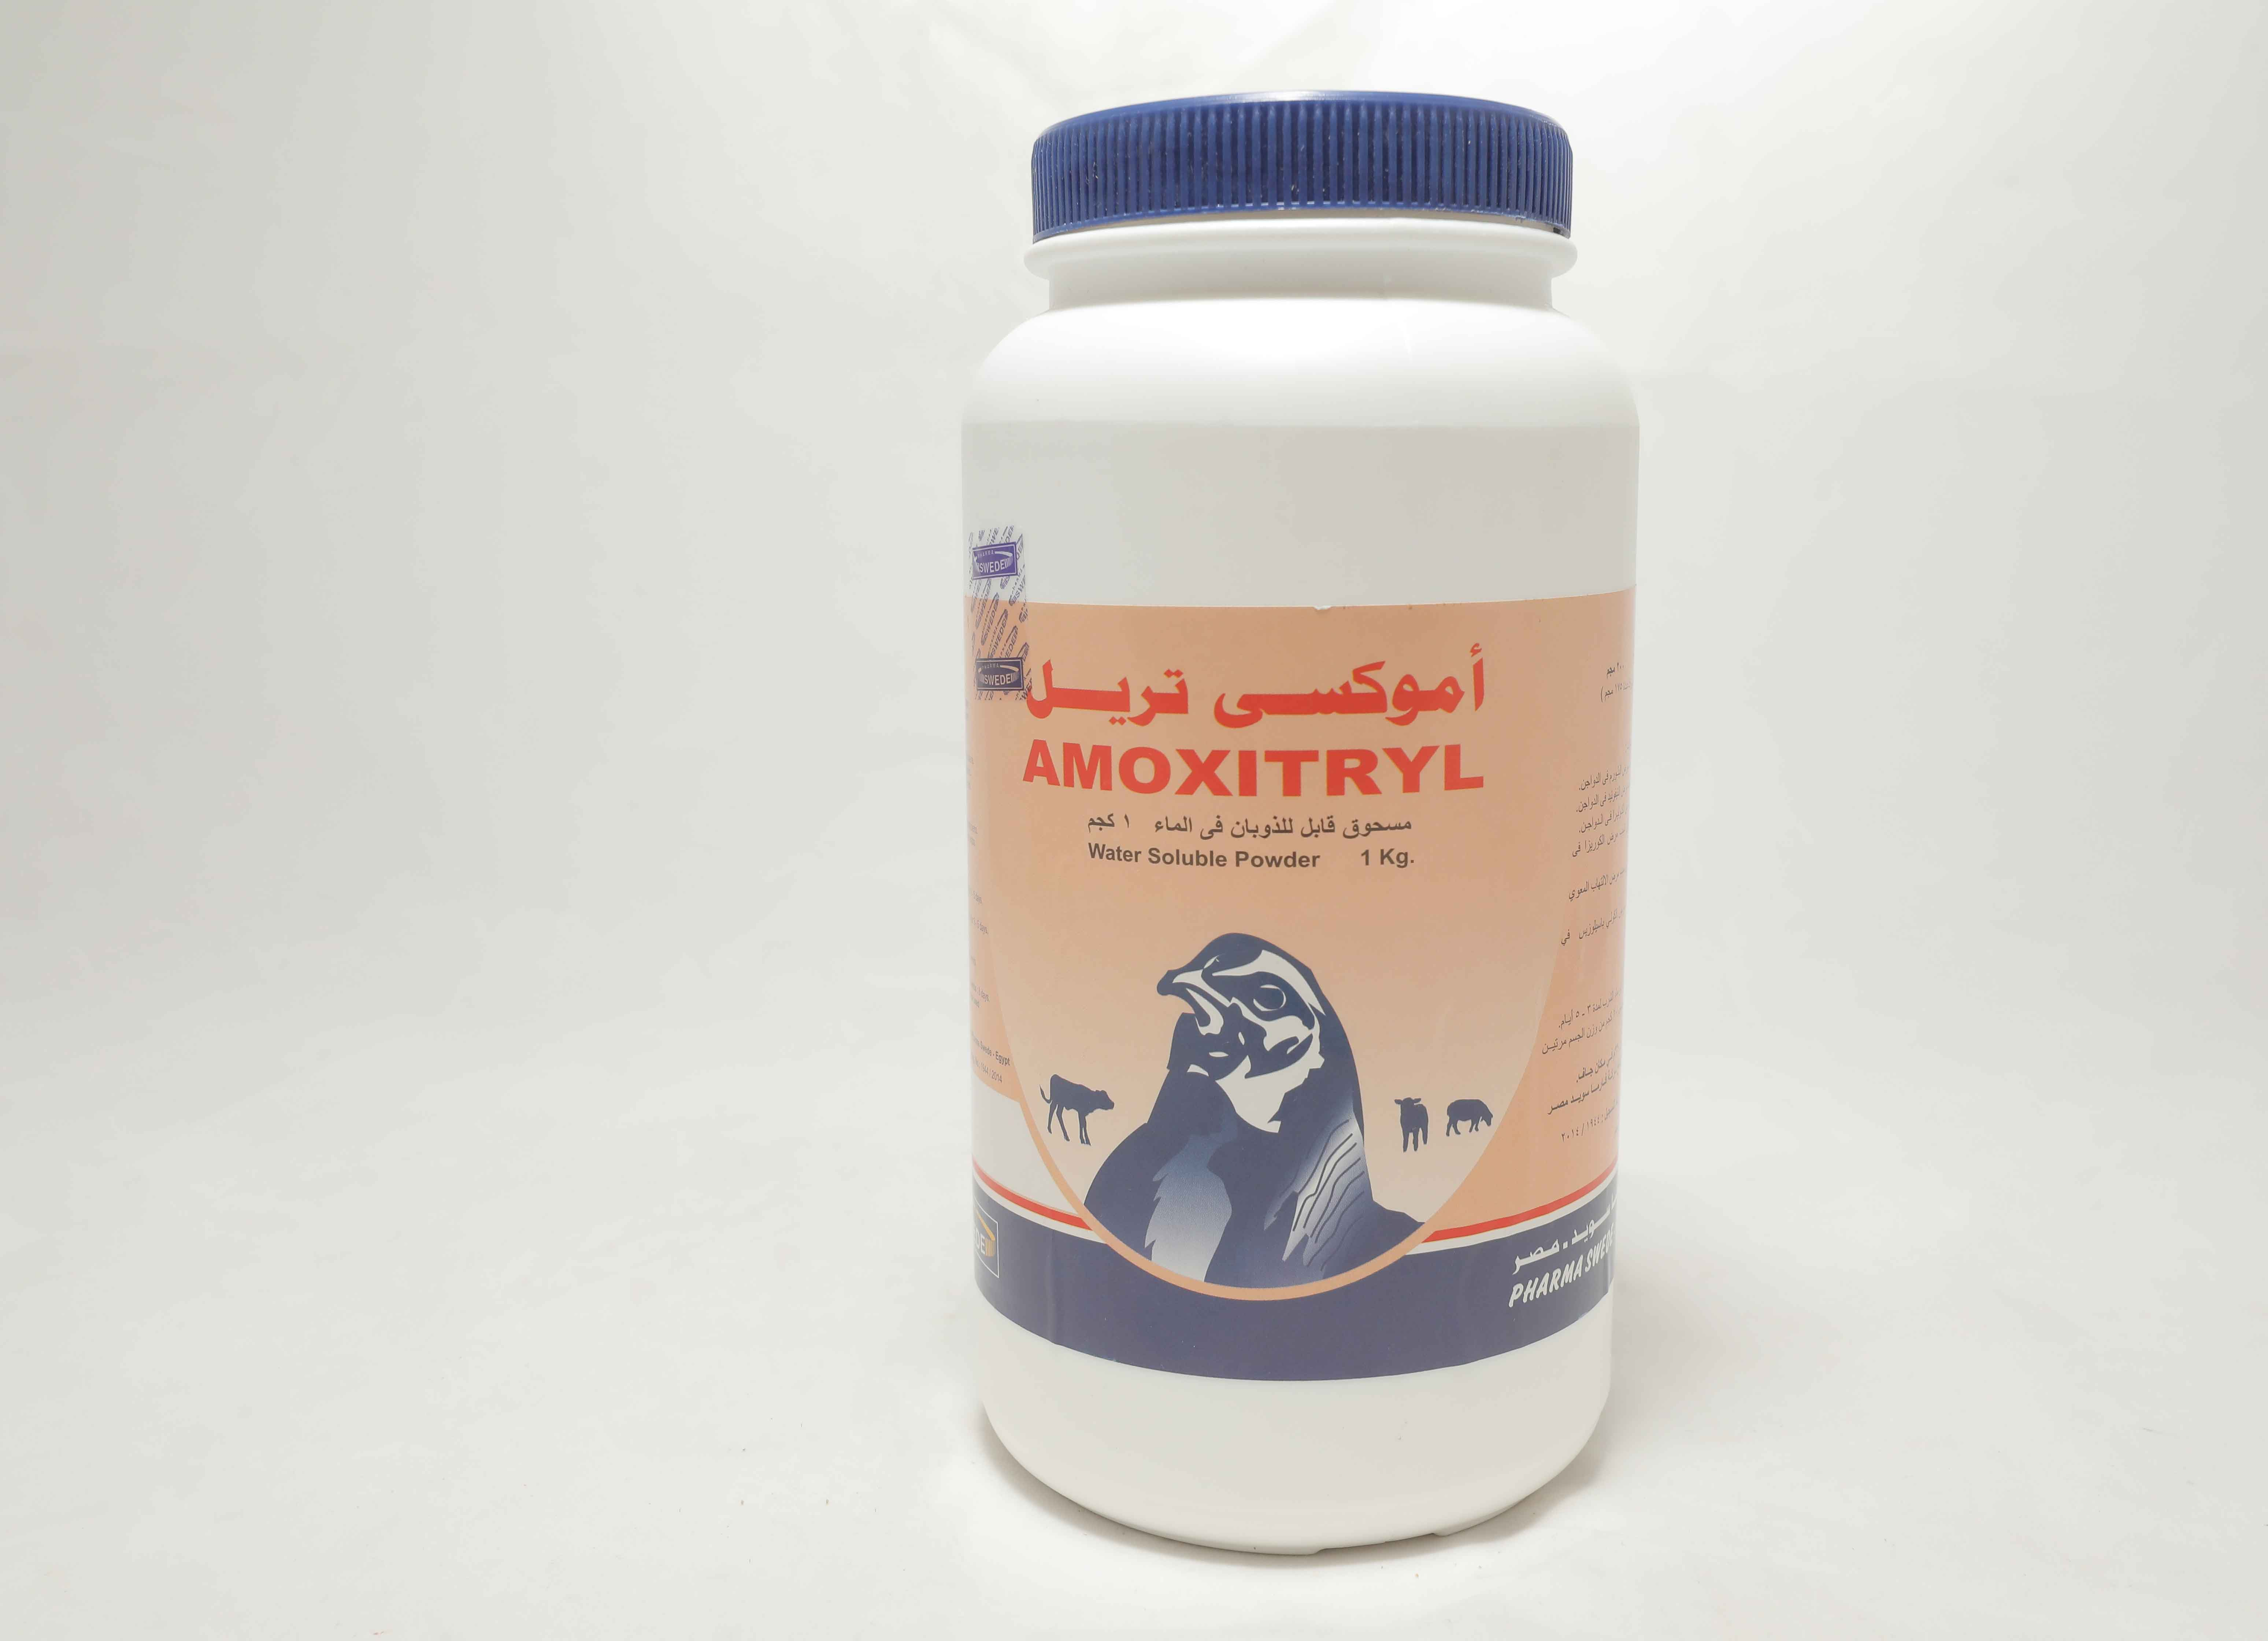 Amoxitryl